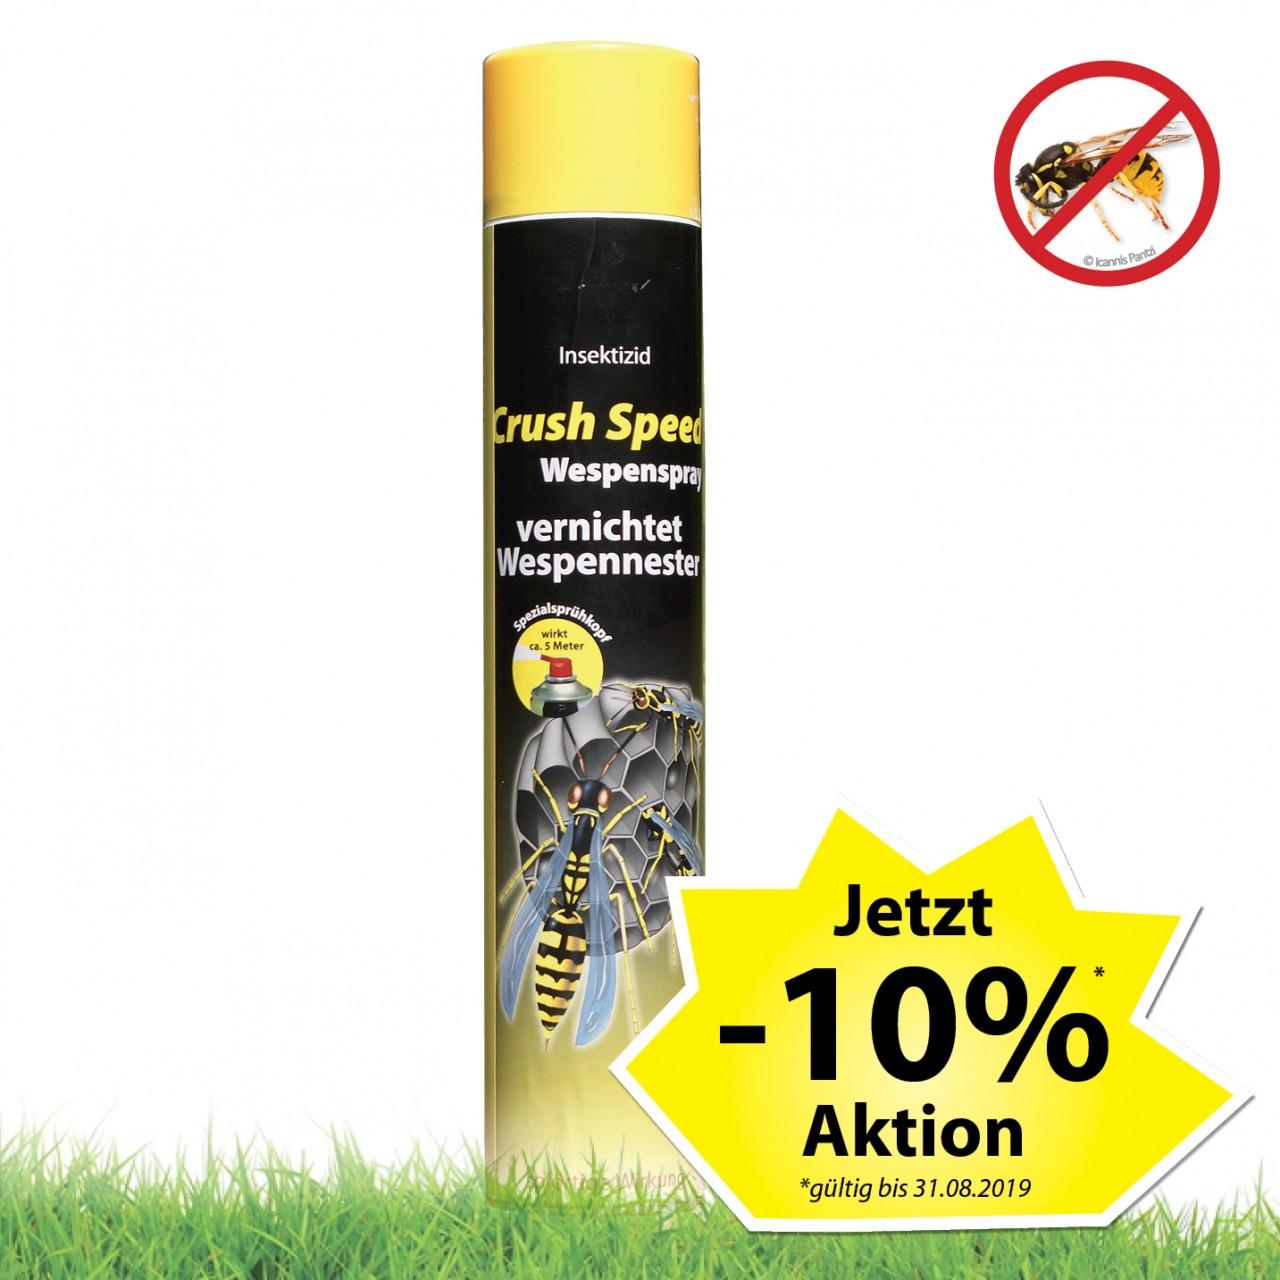 Aktion Crush Speed Wespenspray 750 ml